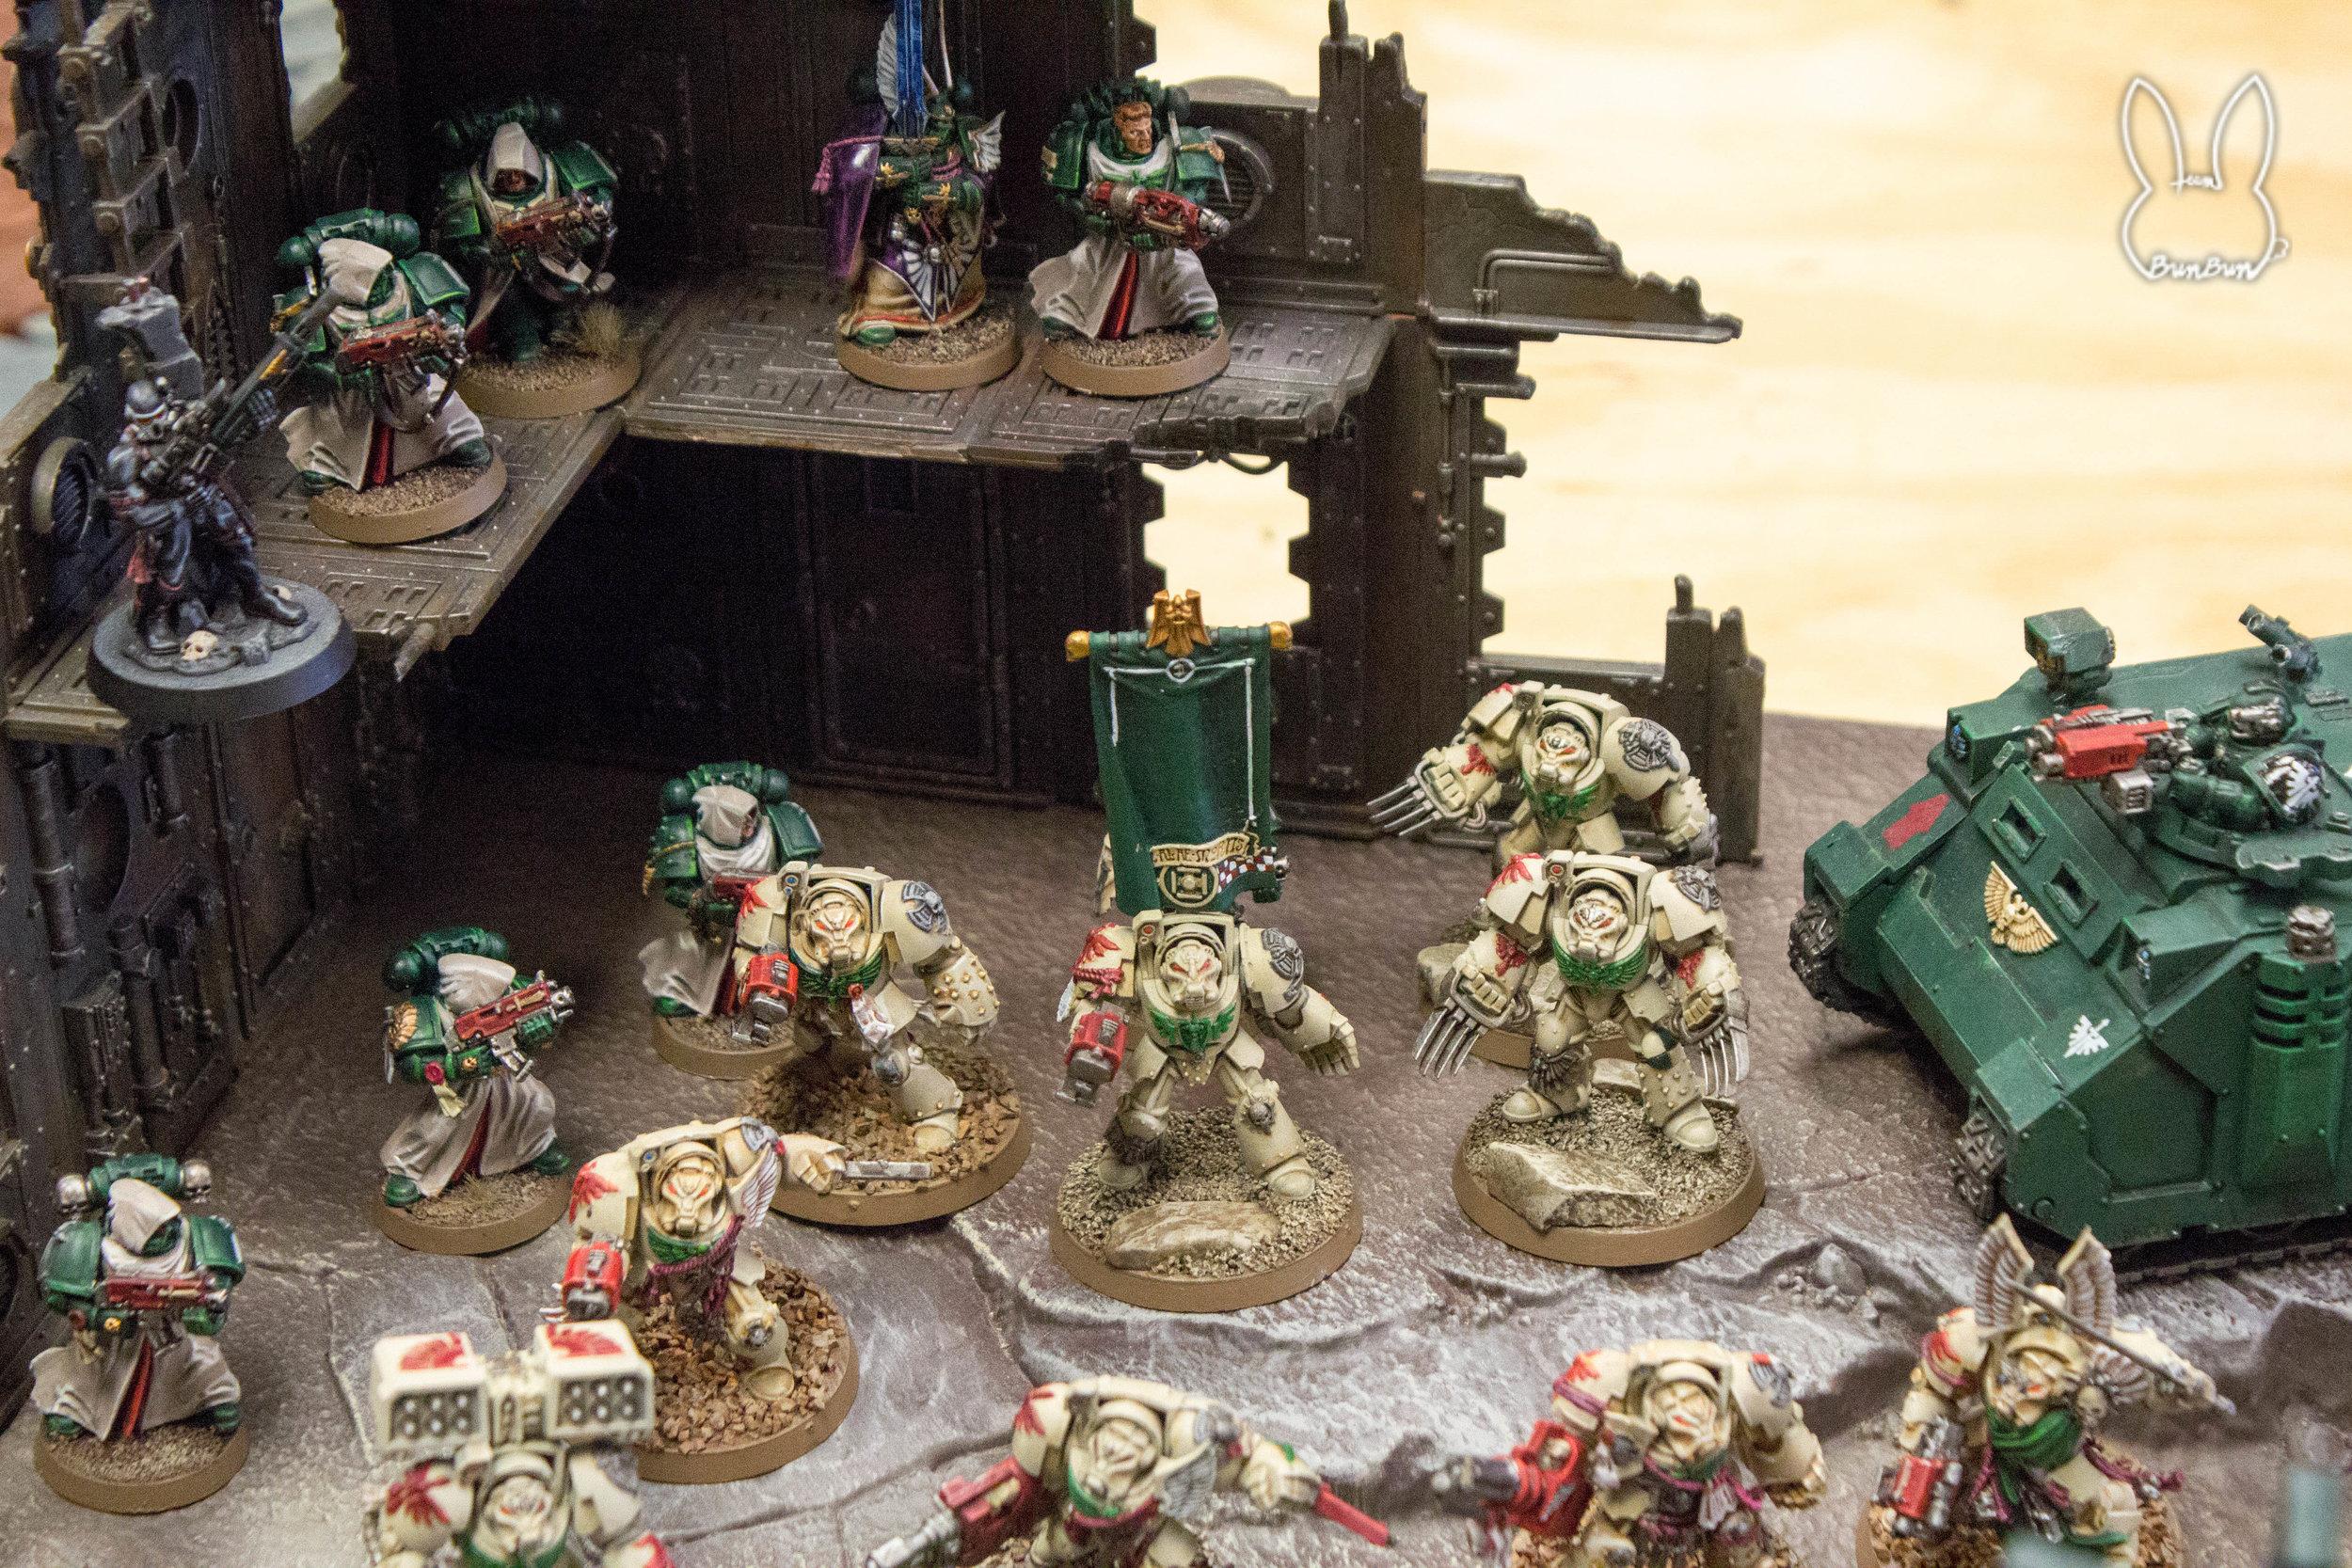 Armies on Parade Houston_54.jpg